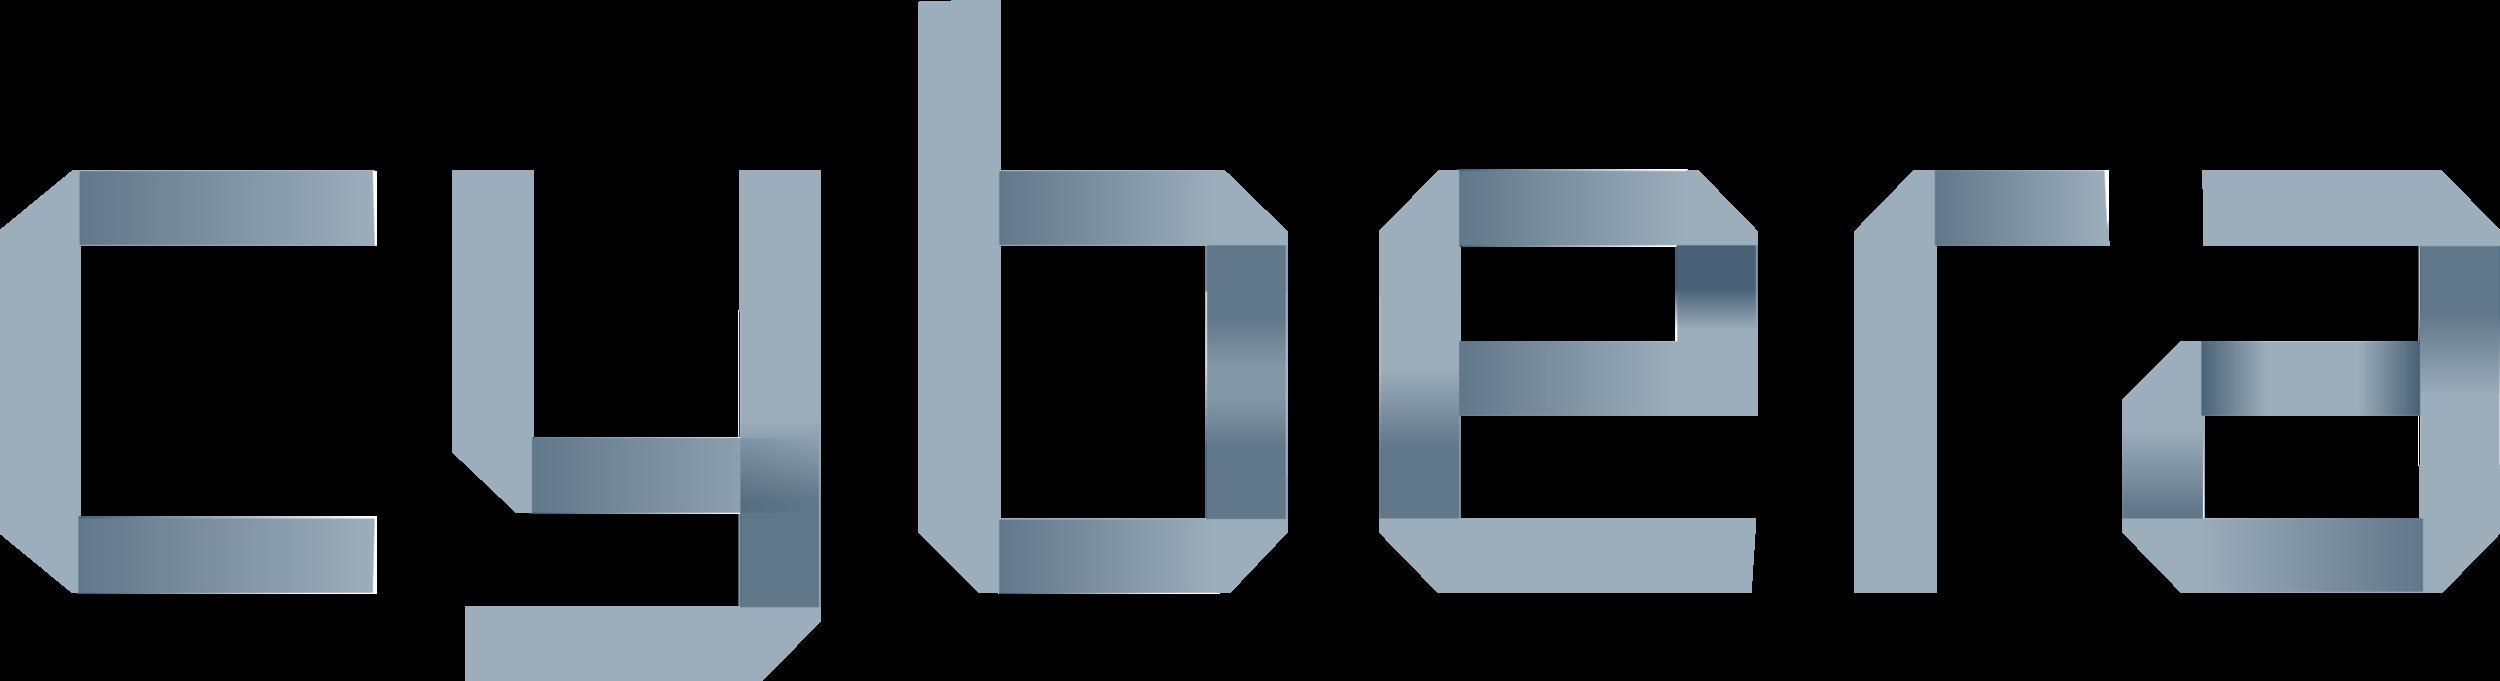 Cybera 2014 Logo PNG.png